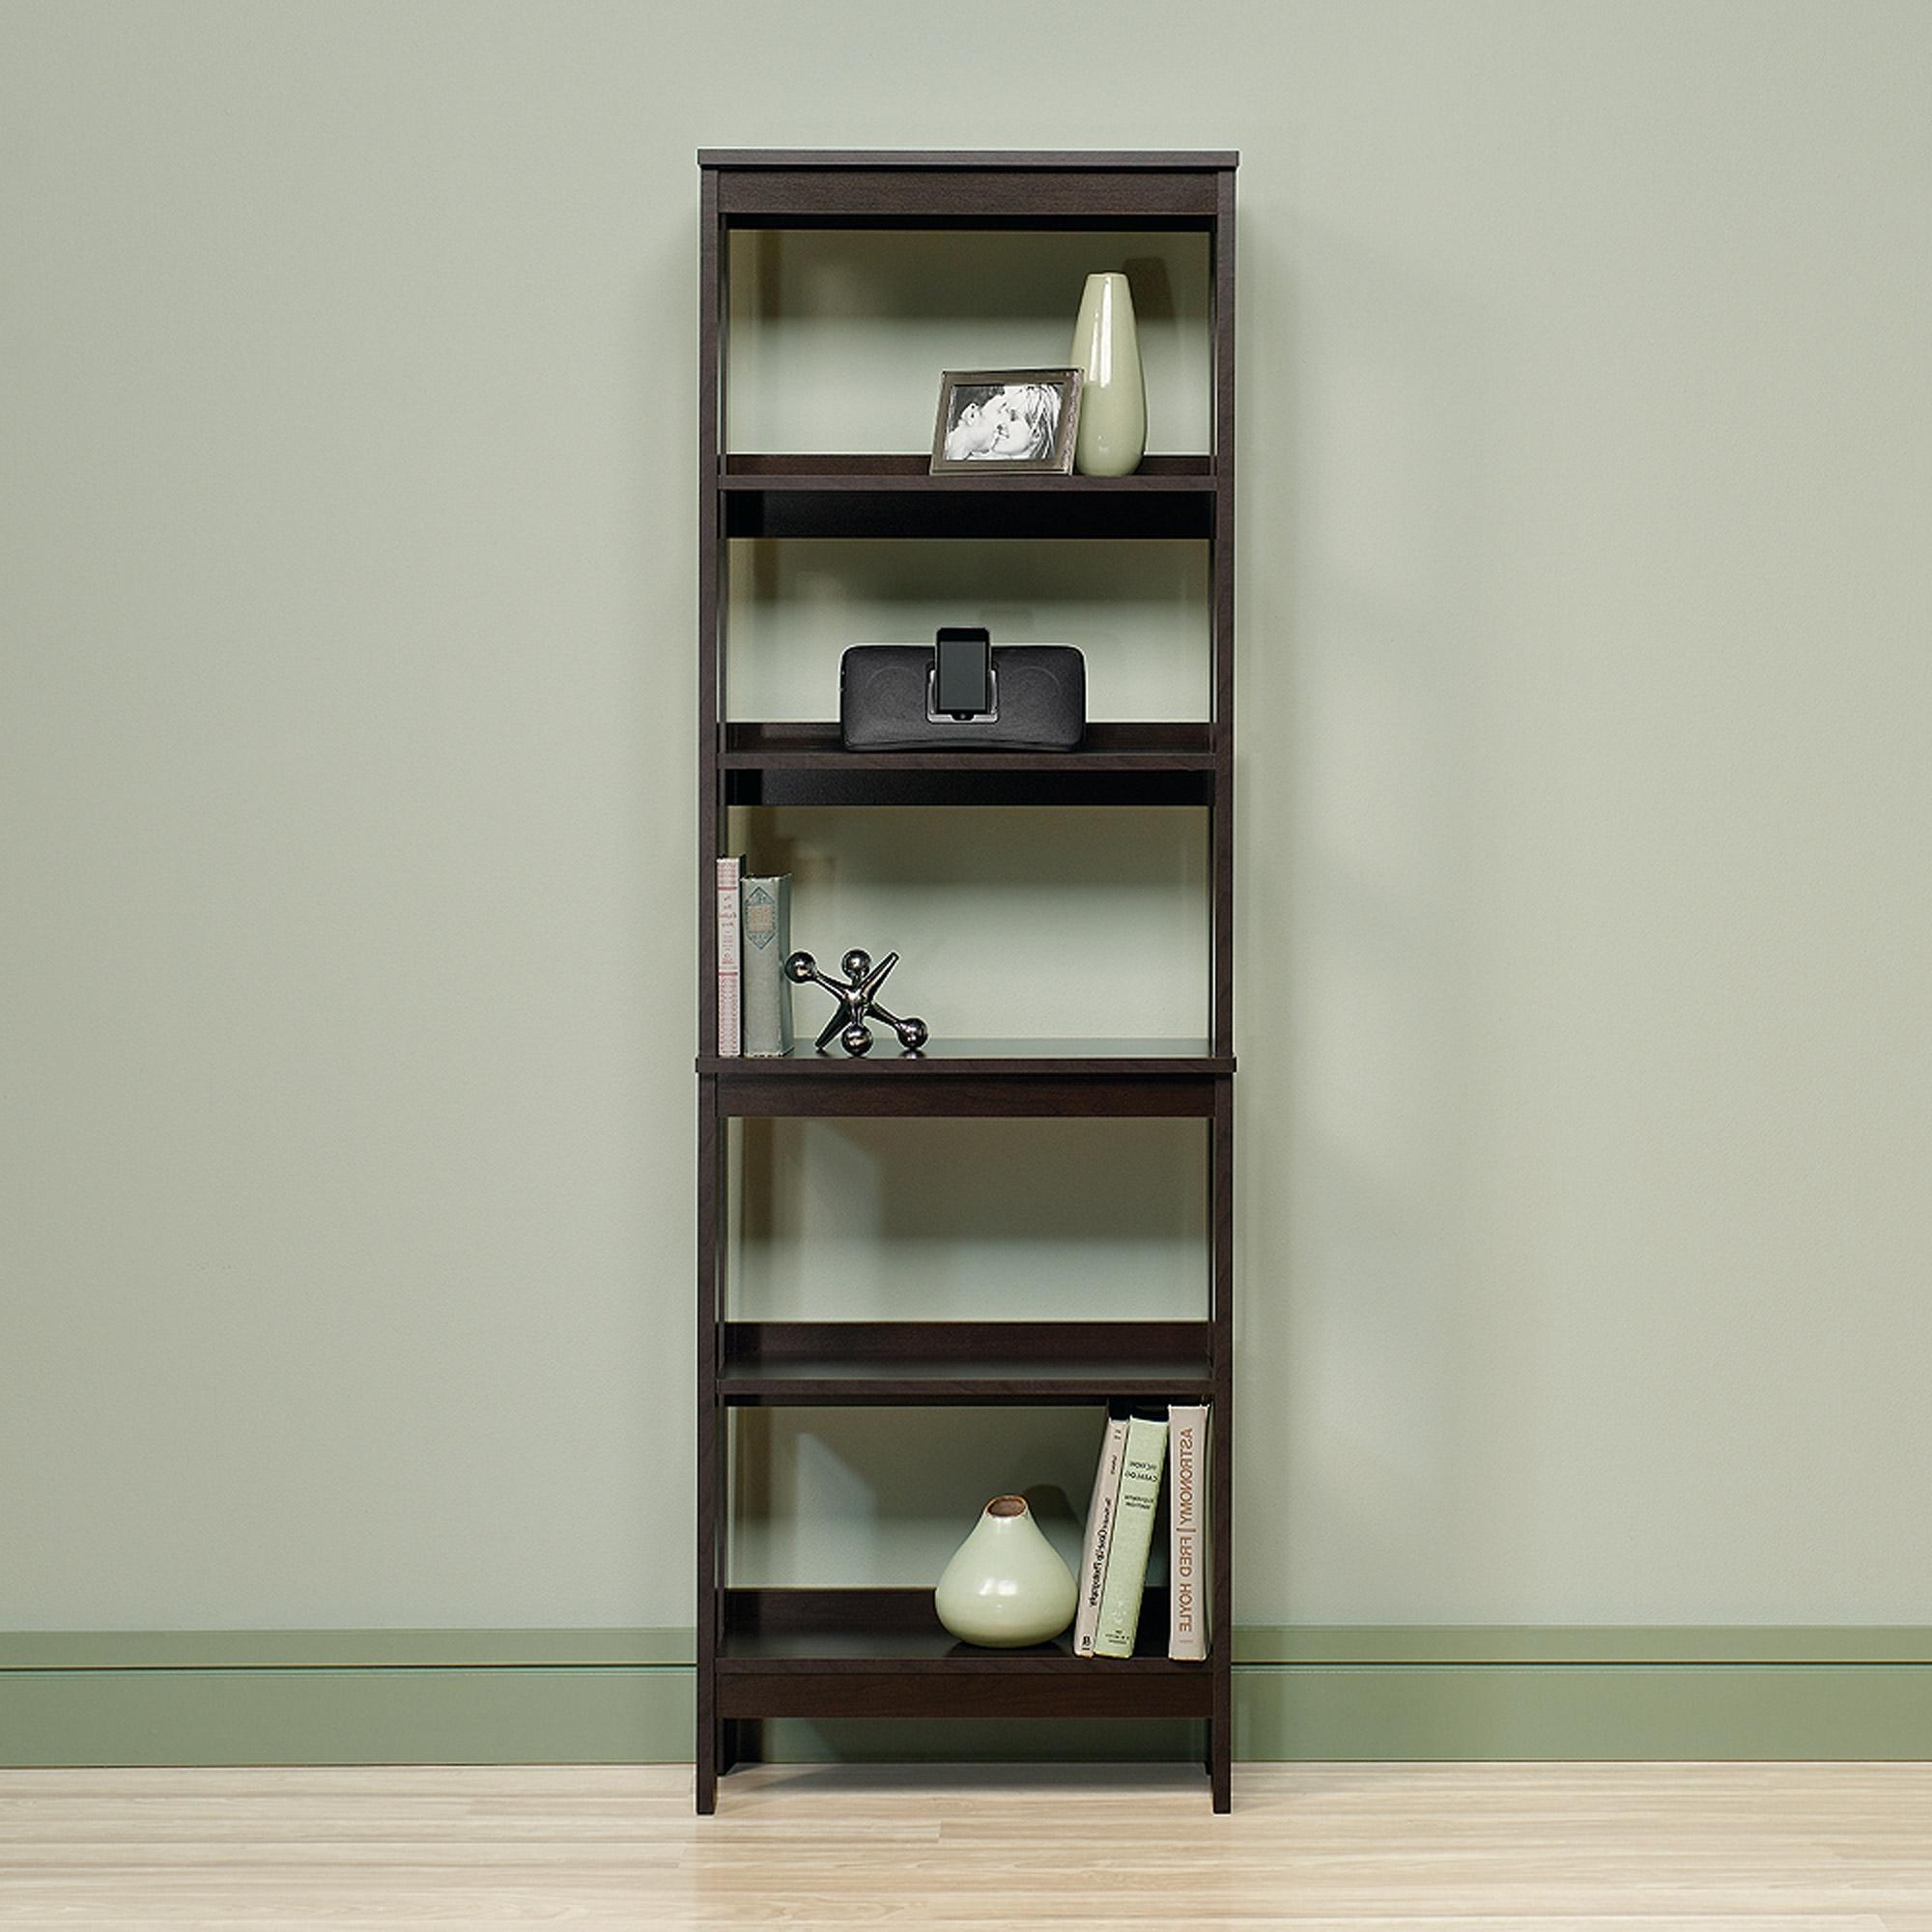 Sauder Beginnings 5 Shelf Bookcase, Cinnamon Cherry Finish In Widely Used Sauder Beginnings 3 Shelf Bookcases (View 13 of 15)